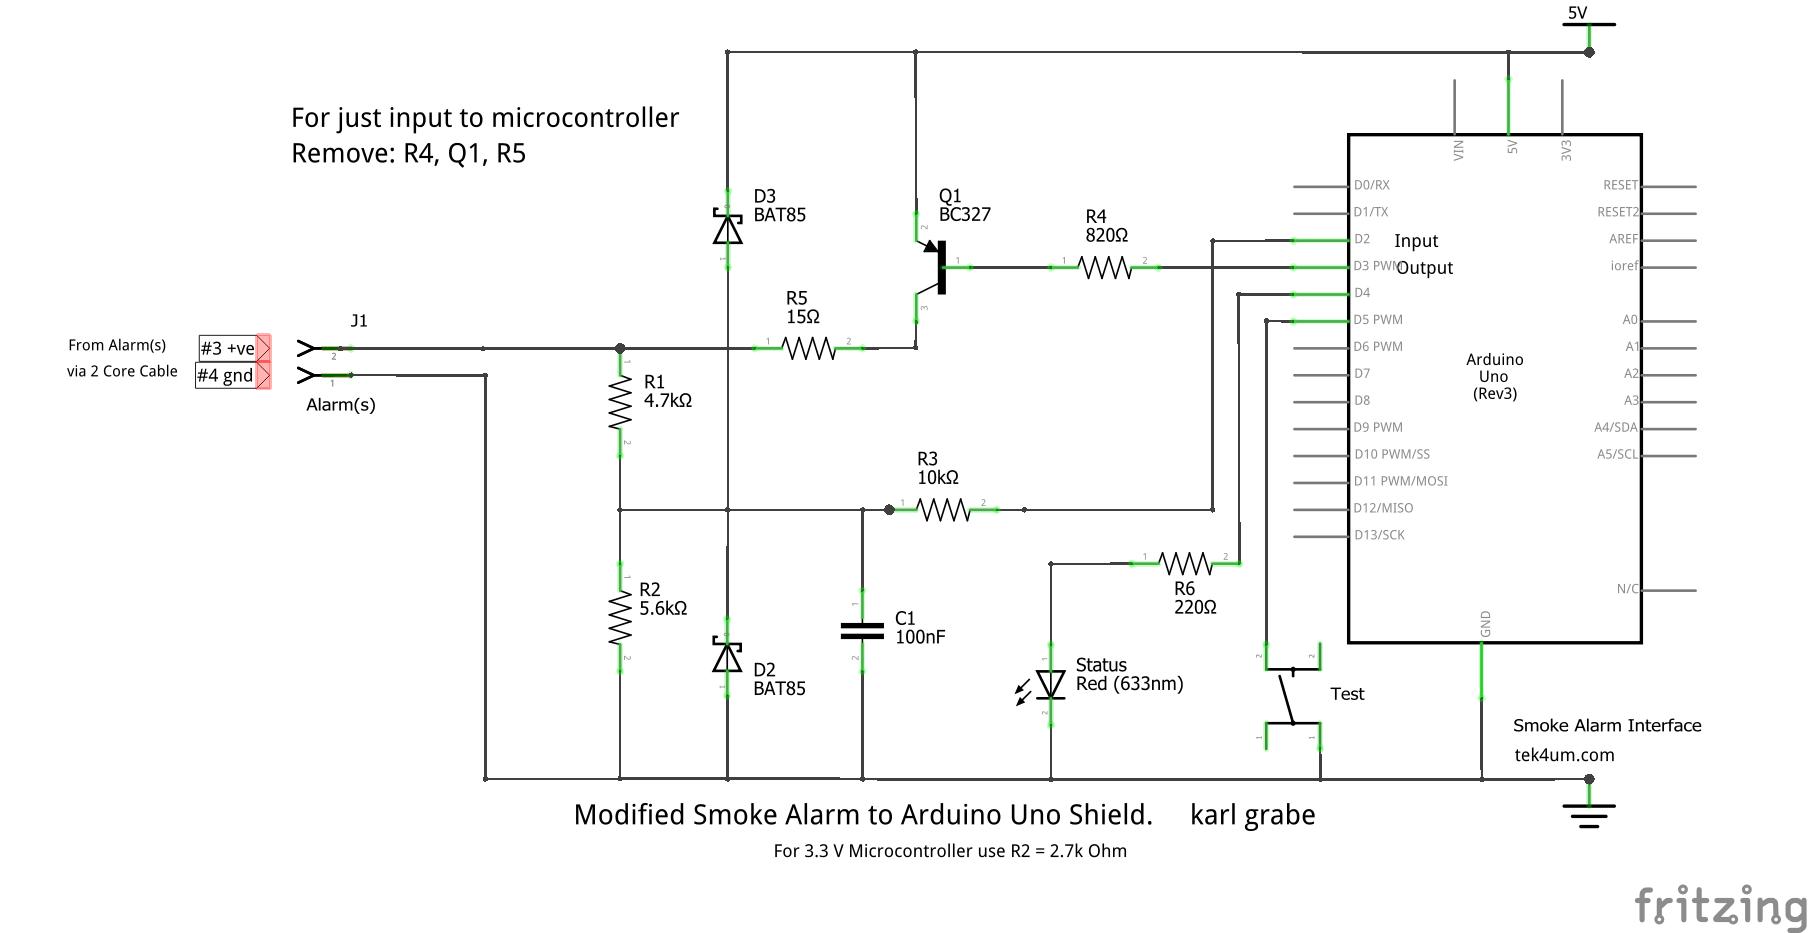 Alarm arduino shield io interface v7 schem ak7tewgpvb